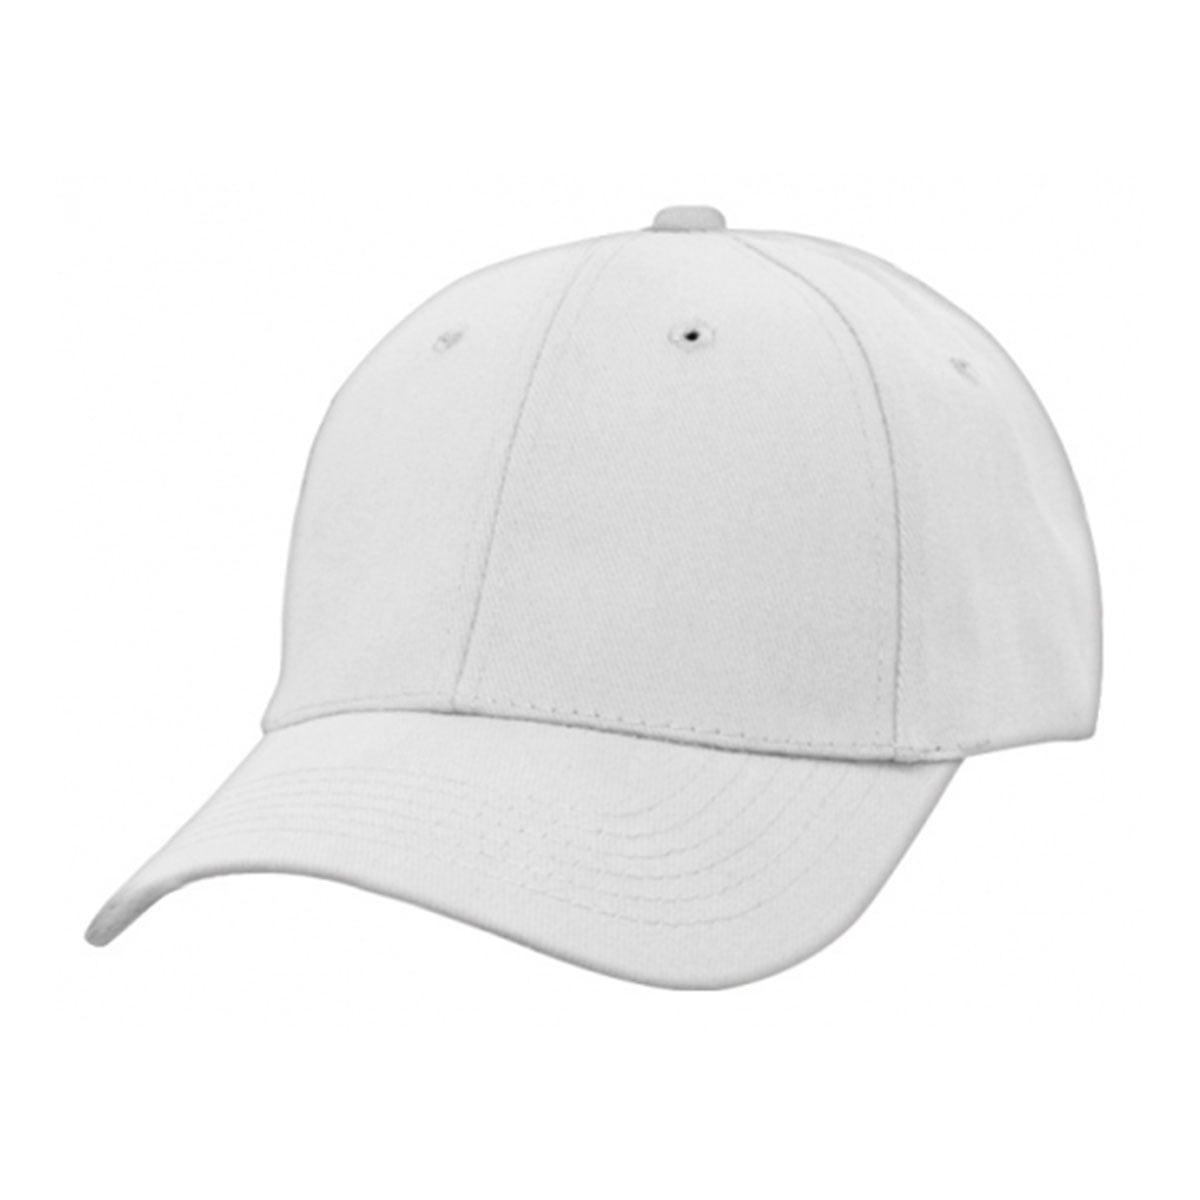 Heavy Brushed Cotton Cap-White